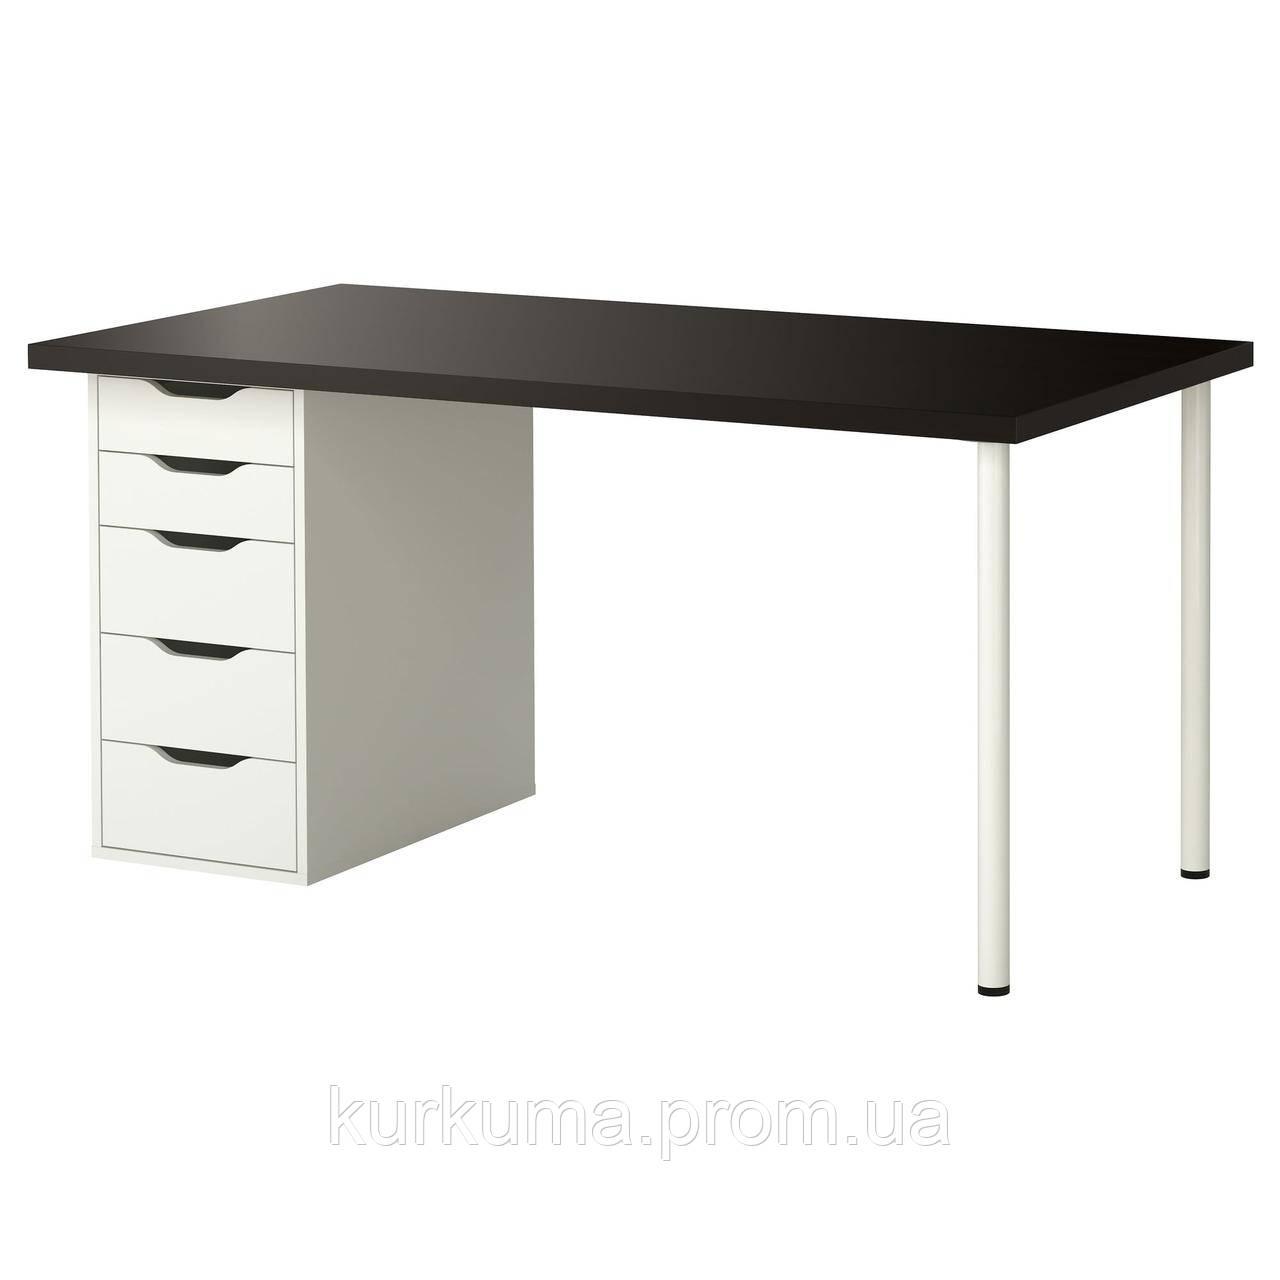 IKEA LINNMON/ALEX Стол, черно-коричневый, белый  (799.326.97)